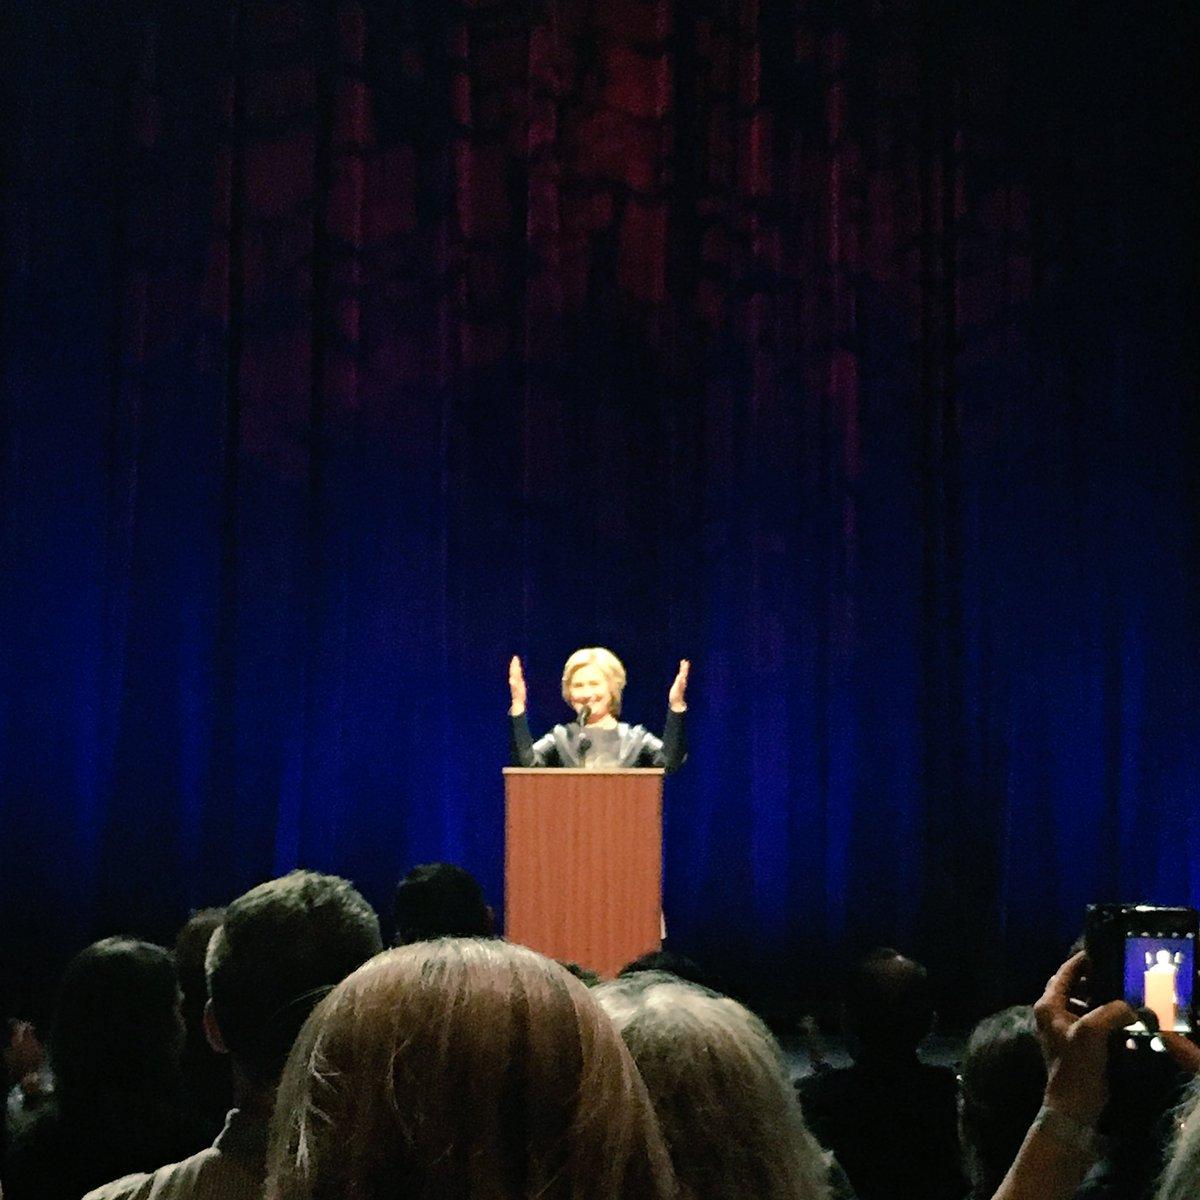 Secretary @HillaryClinton gave a rousing speech tonight in San Francisco. Inspiring & moving. #ImWithHer https://t.co/z16r4Szy08